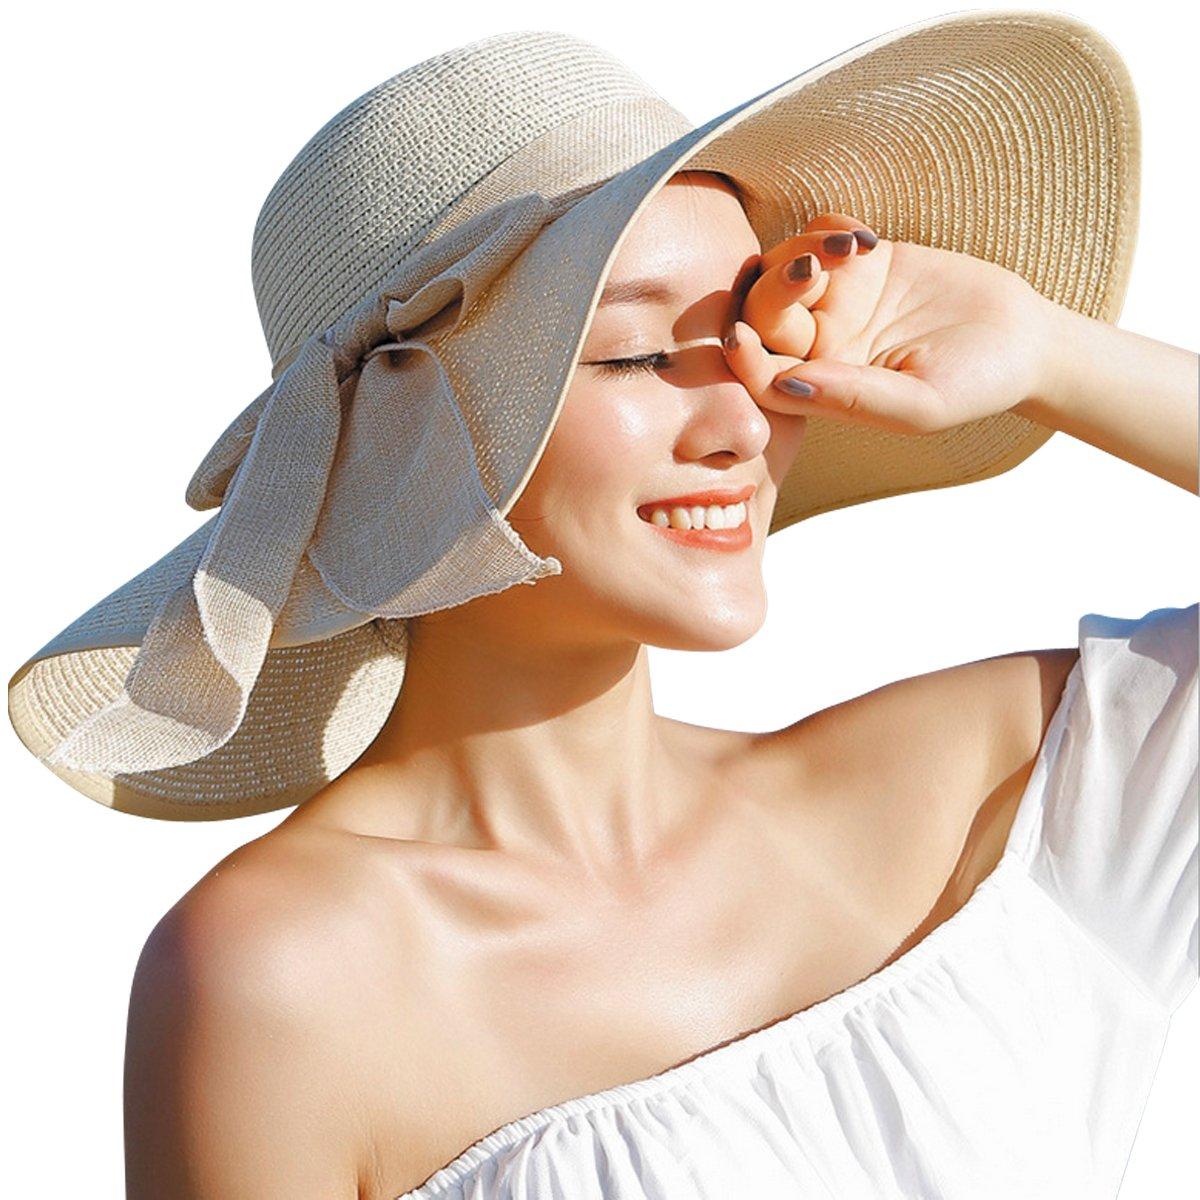 081837585c5a0 Lanzom Womens Big Bowknot Straw Hat Floppy Foldable Roll up Beach Cap Sun  Hat UPF 50+ (Beige